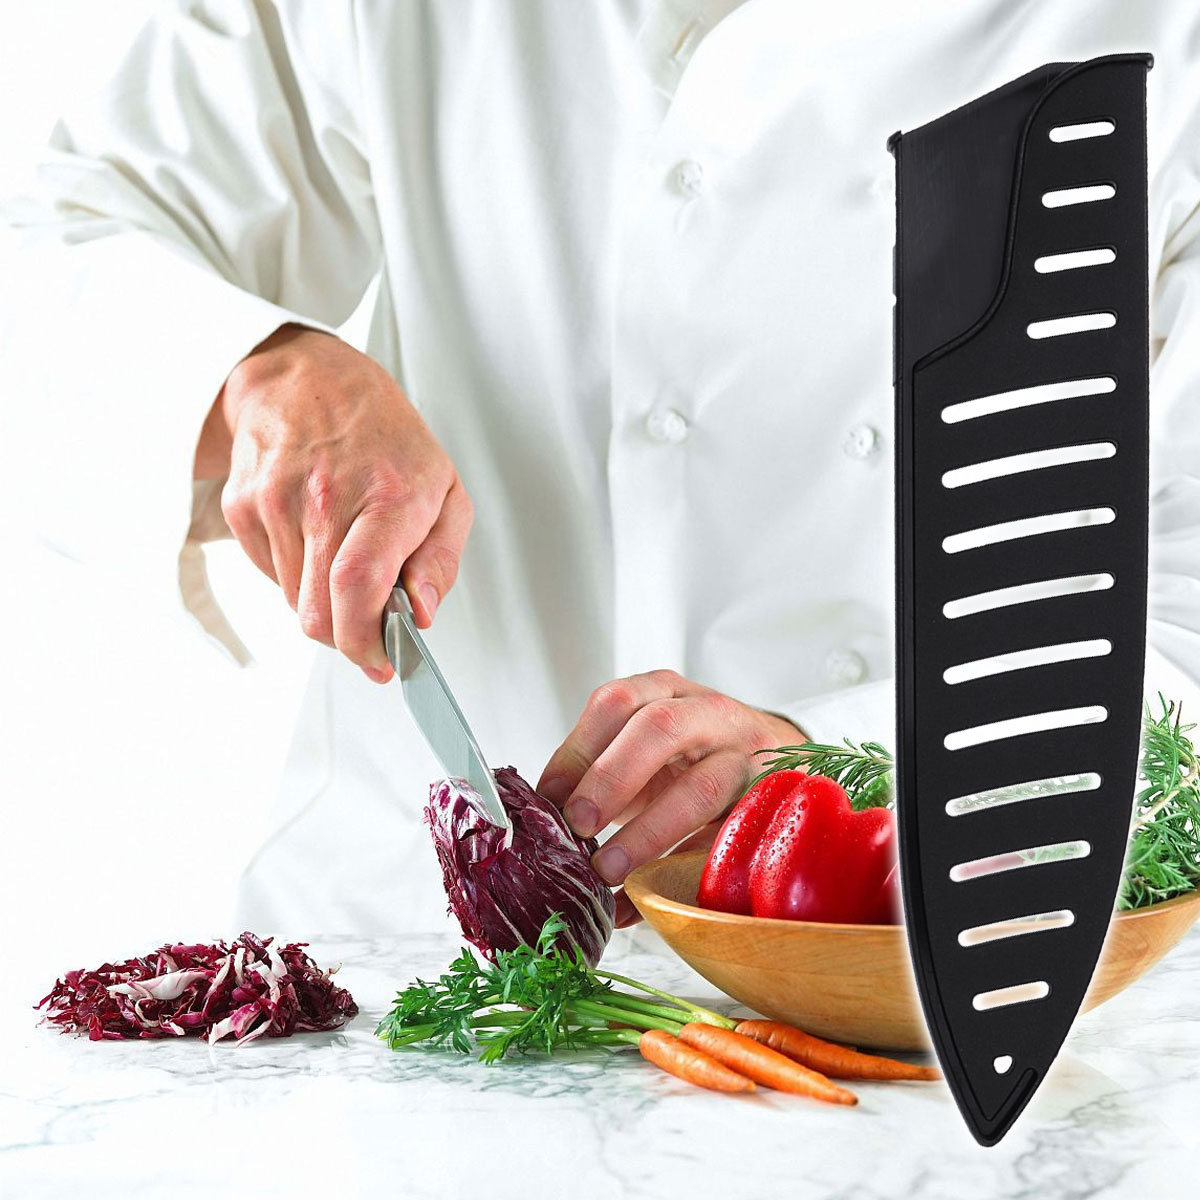 3pcs Knife Protector Kitchen Sheath  Black Plastic Kitchen Knife Blade Protector Cover For 8 Inches Knife